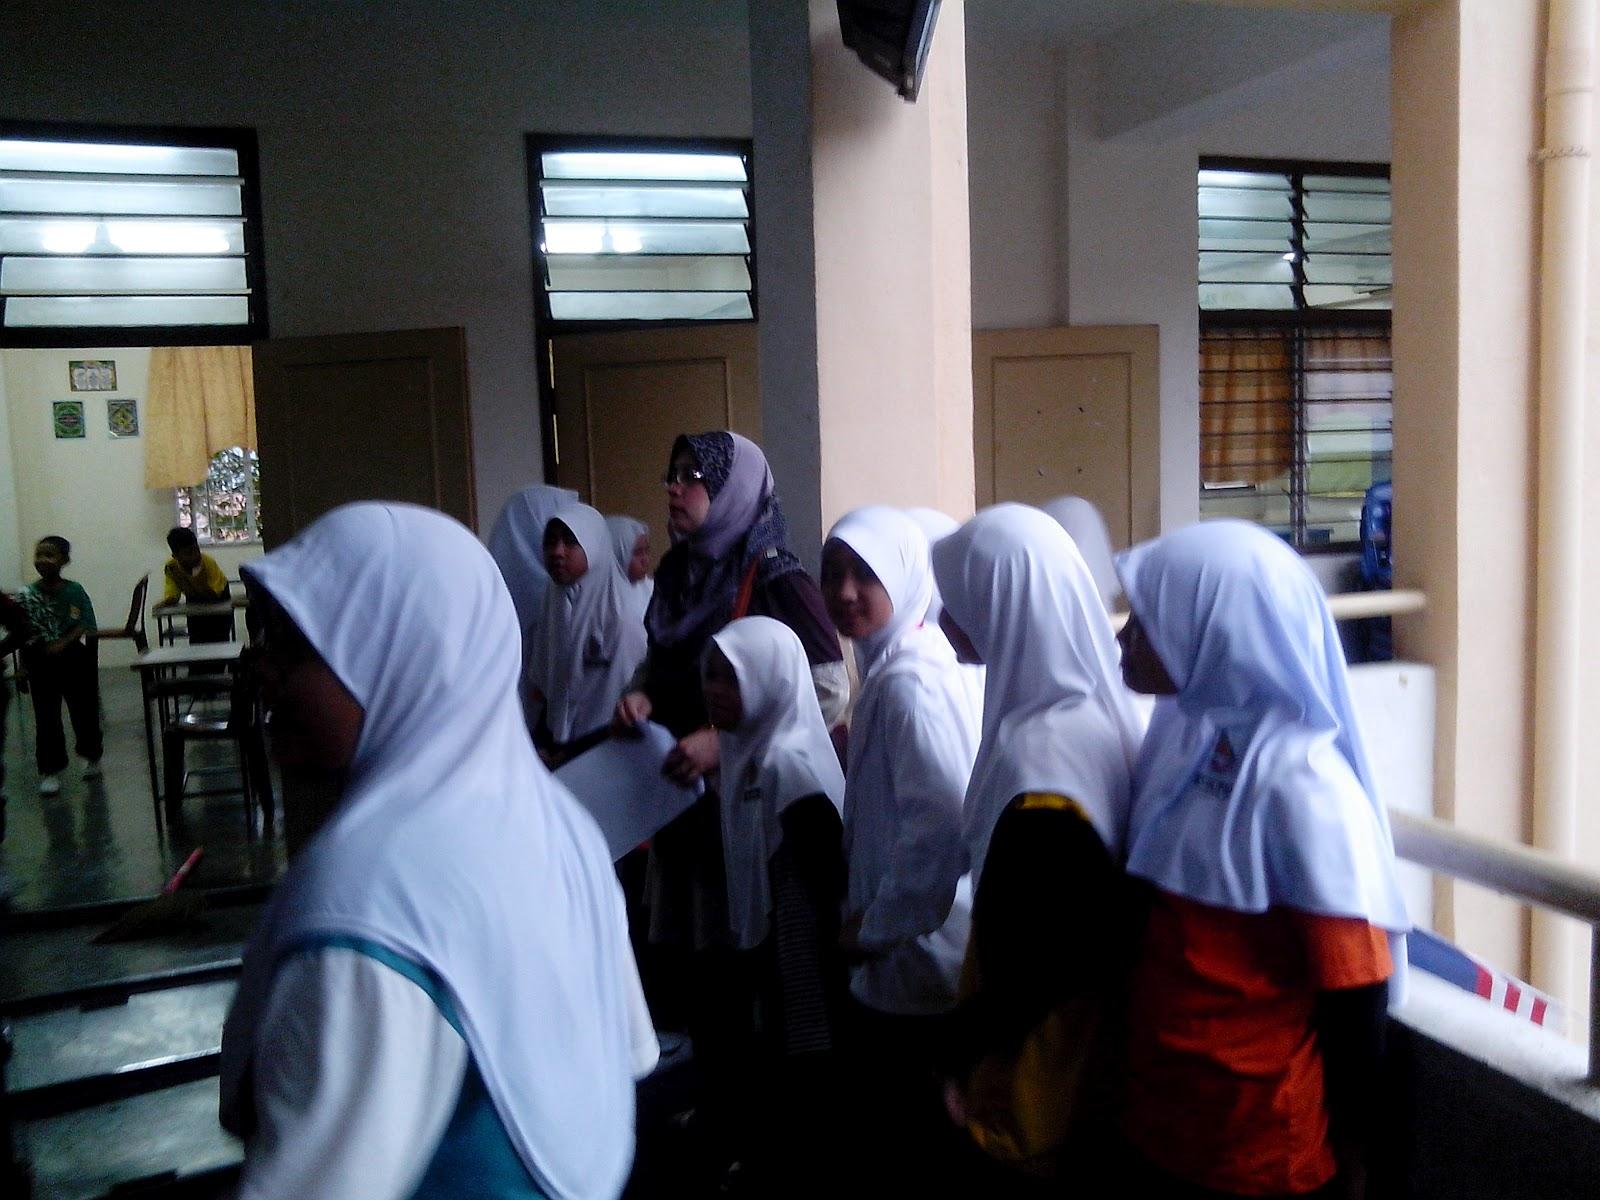 Contoh Berita Pengumuman Gotong Royong Di Sekolah